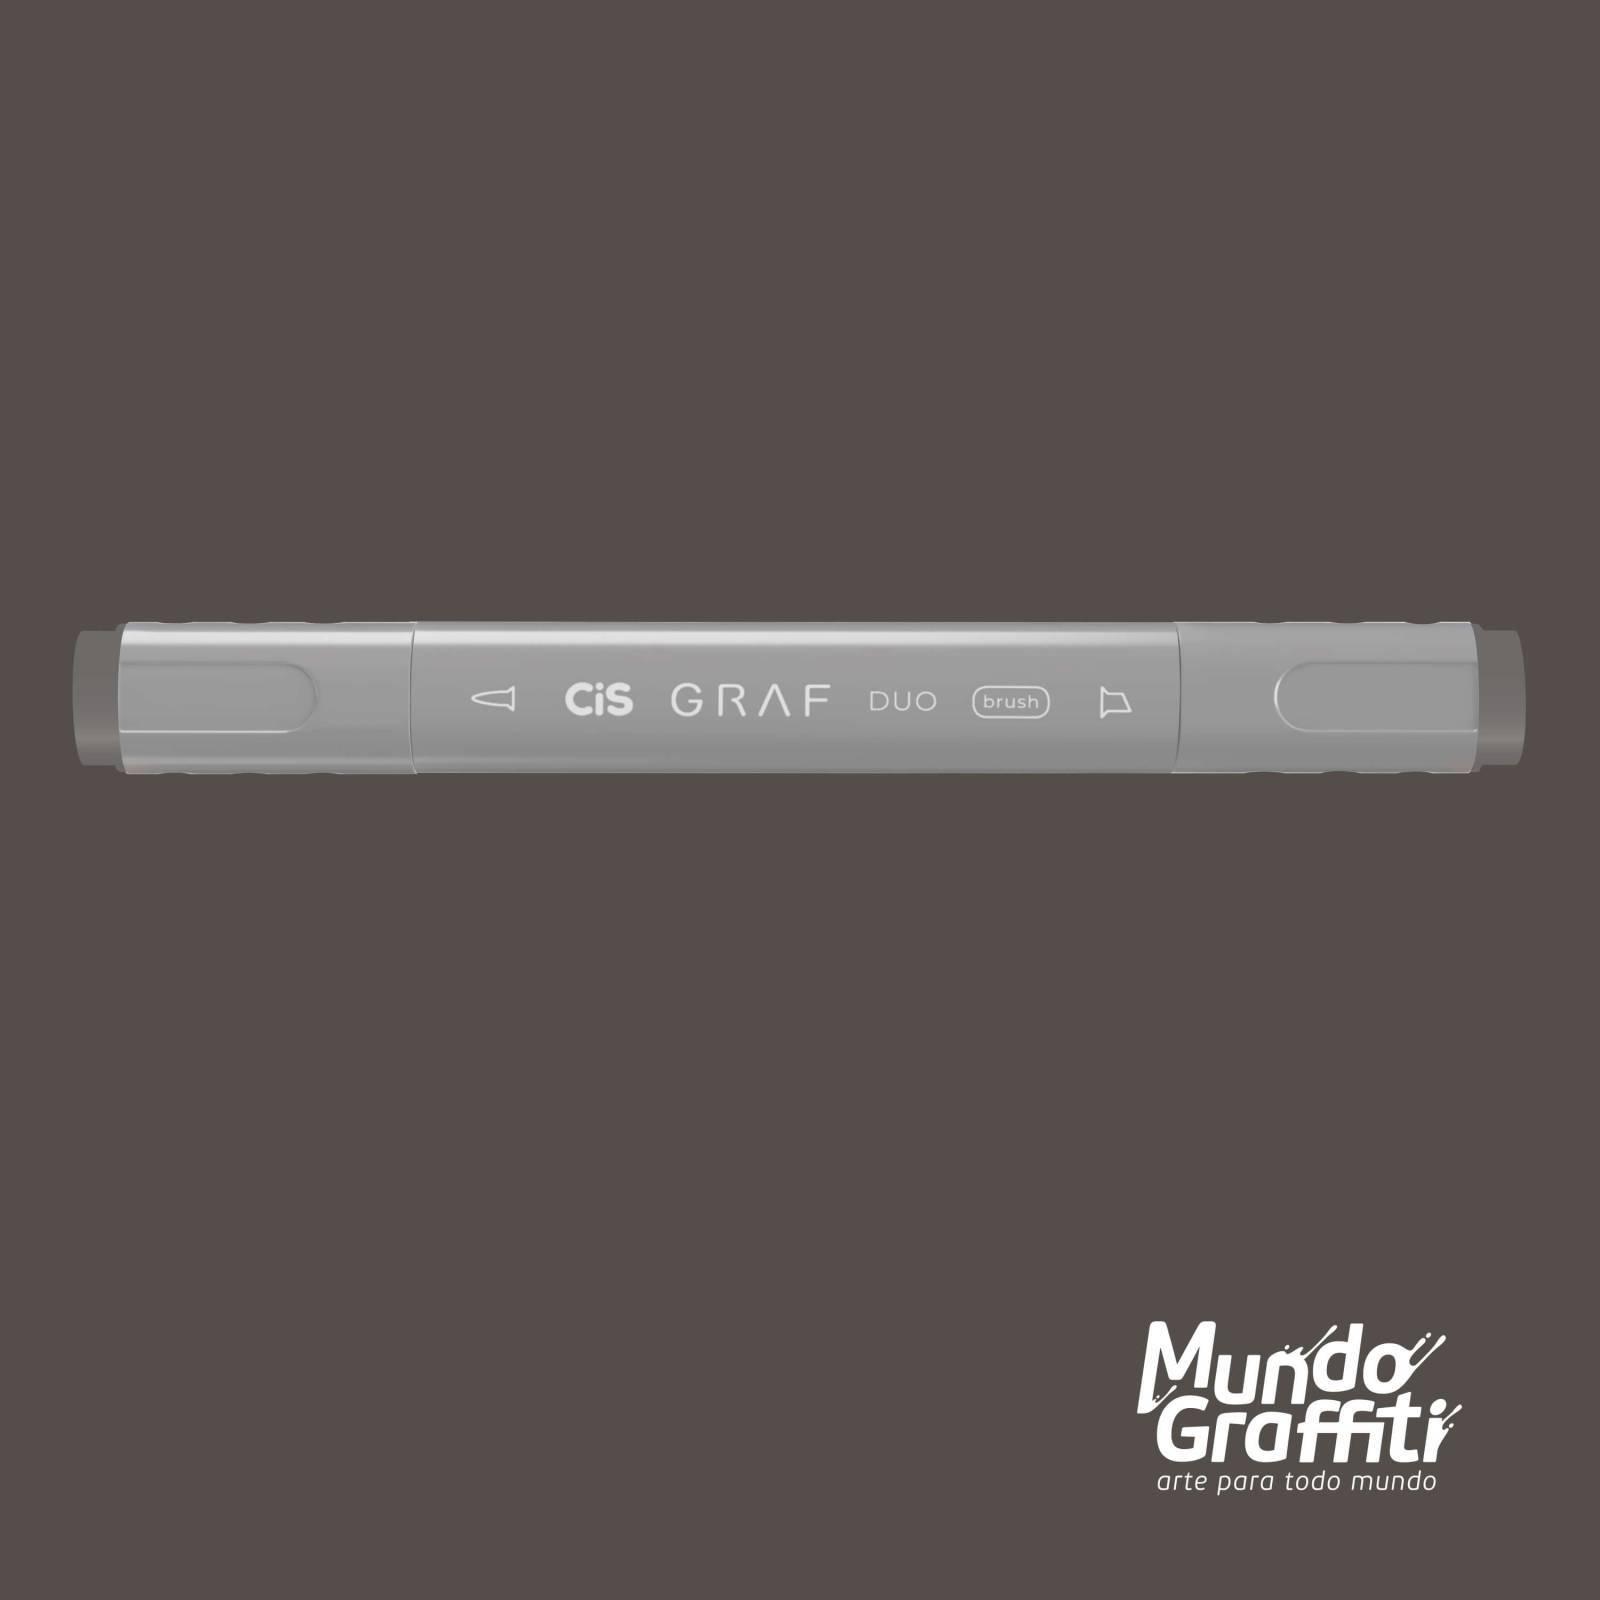 Marcador Cis Graf Duo Brush Warm Grey WG5 - Mundo Graffiti